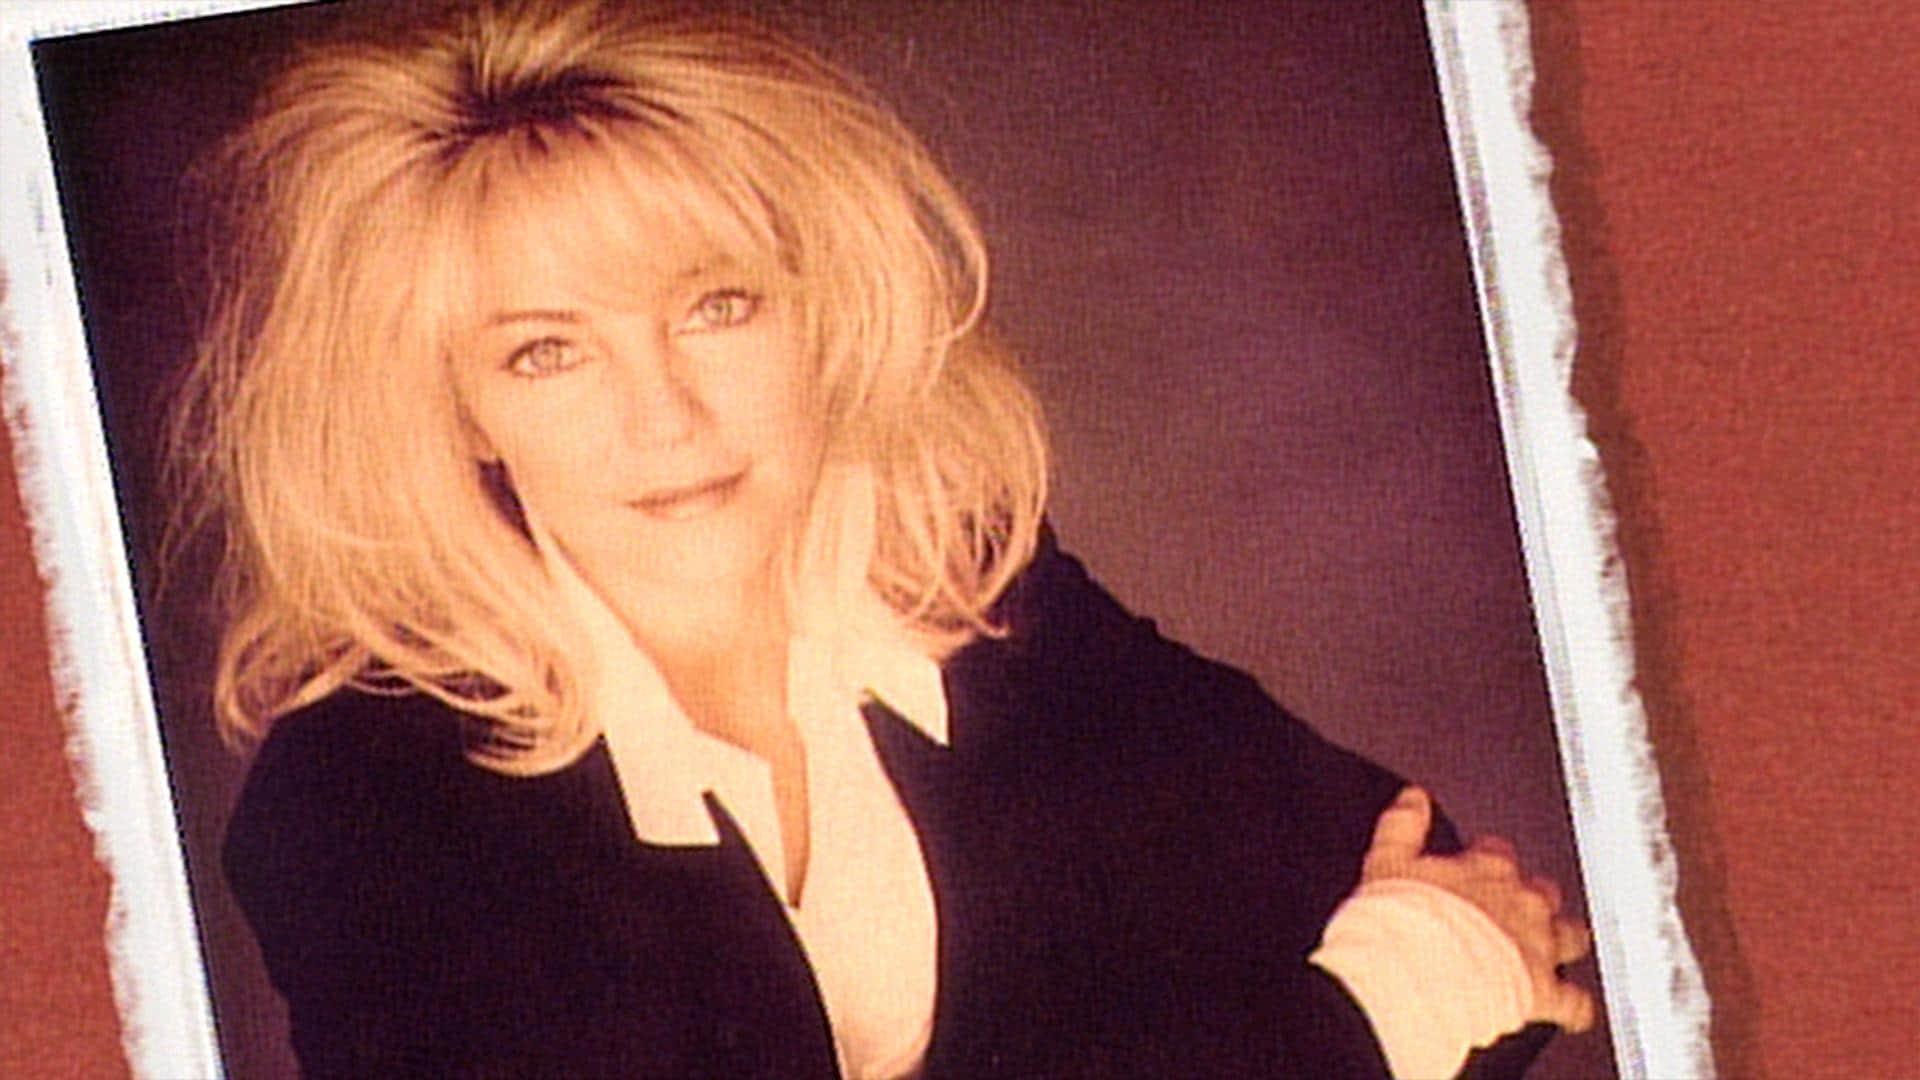 Heather Locklear: May 14, 1994